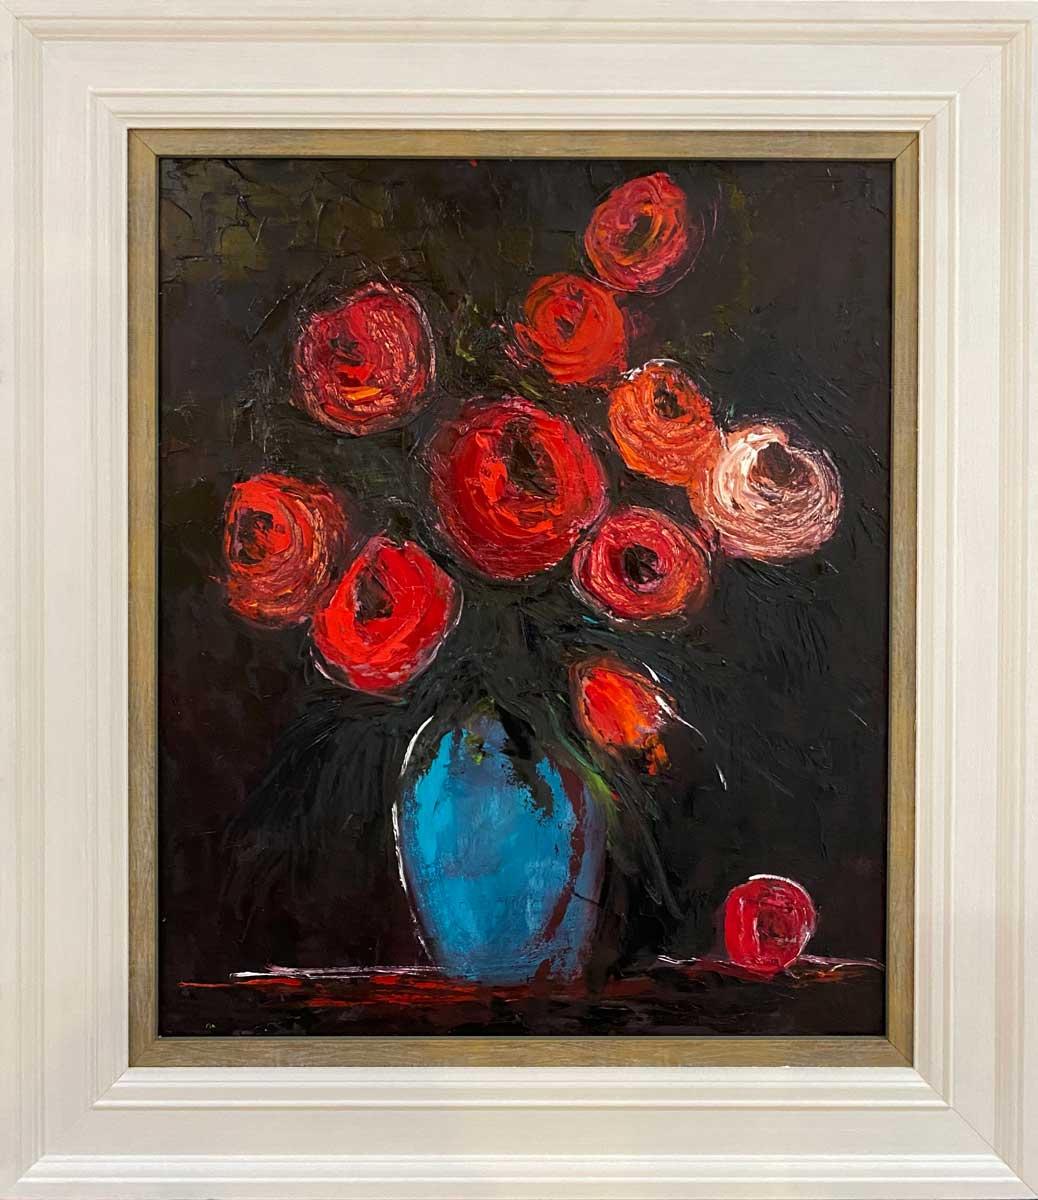 Roses My Luv - Original floral oil painting